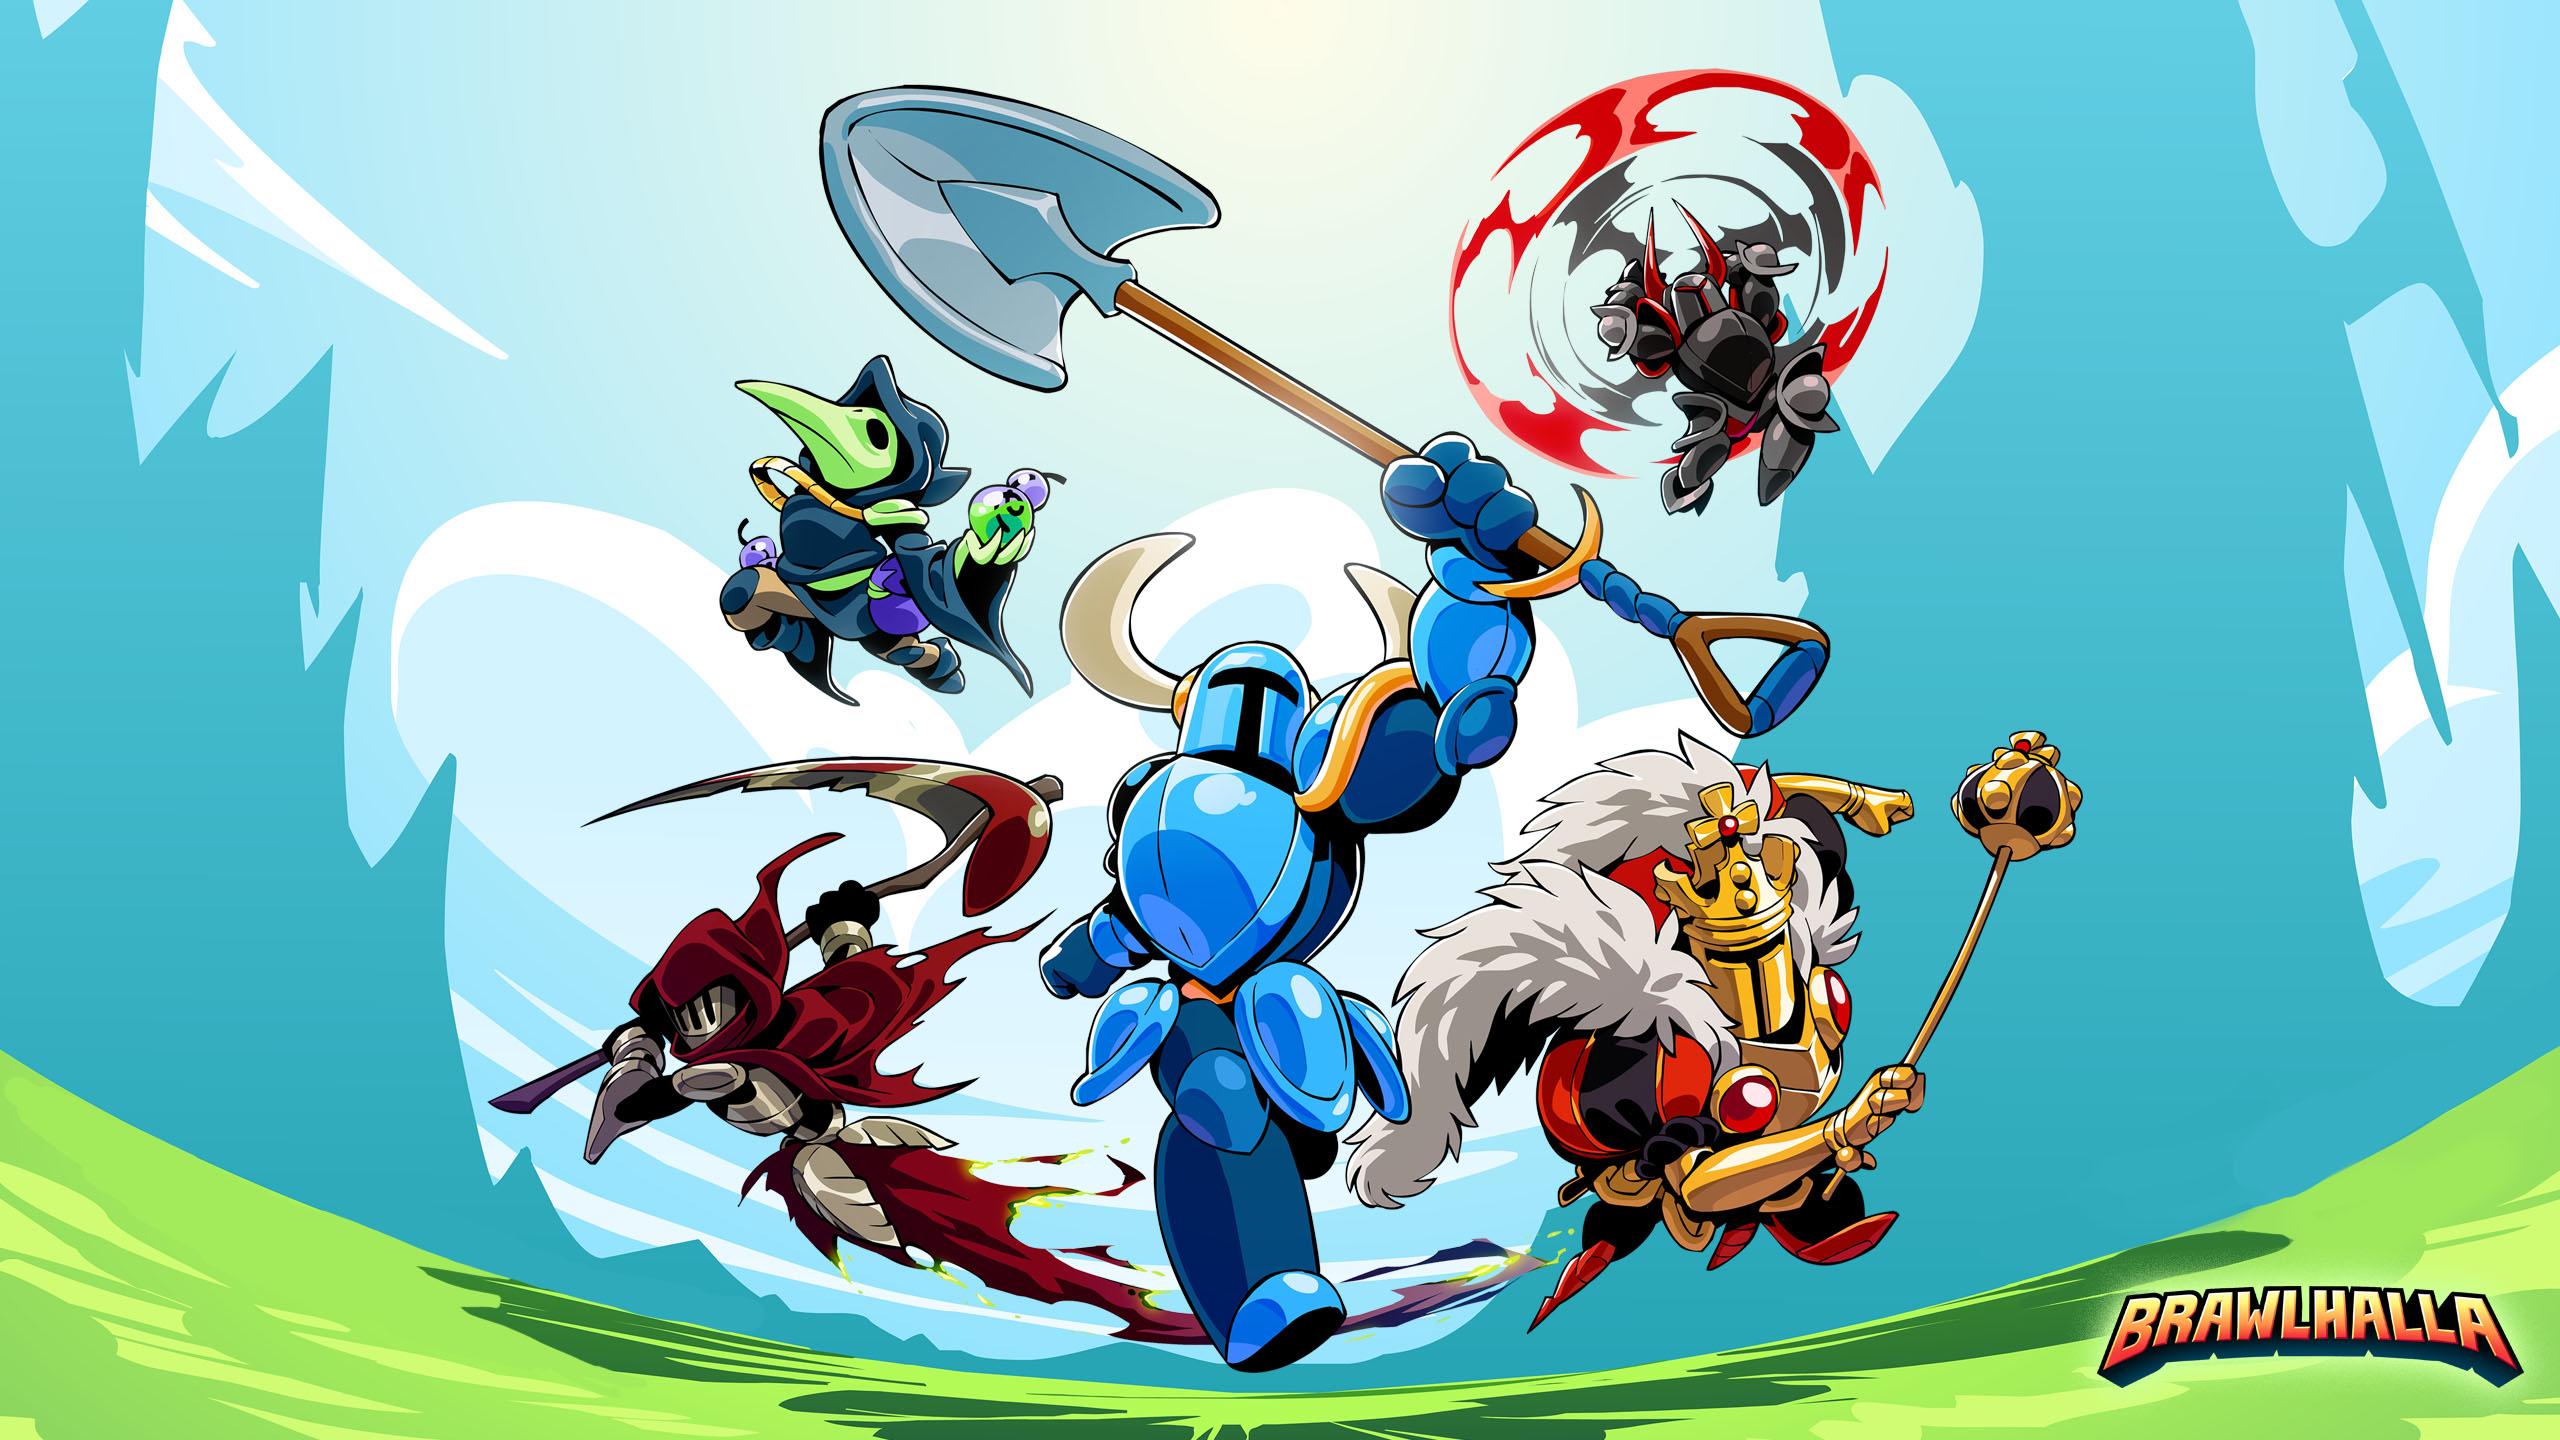 Brawlhalla Game Poster 2560x1440